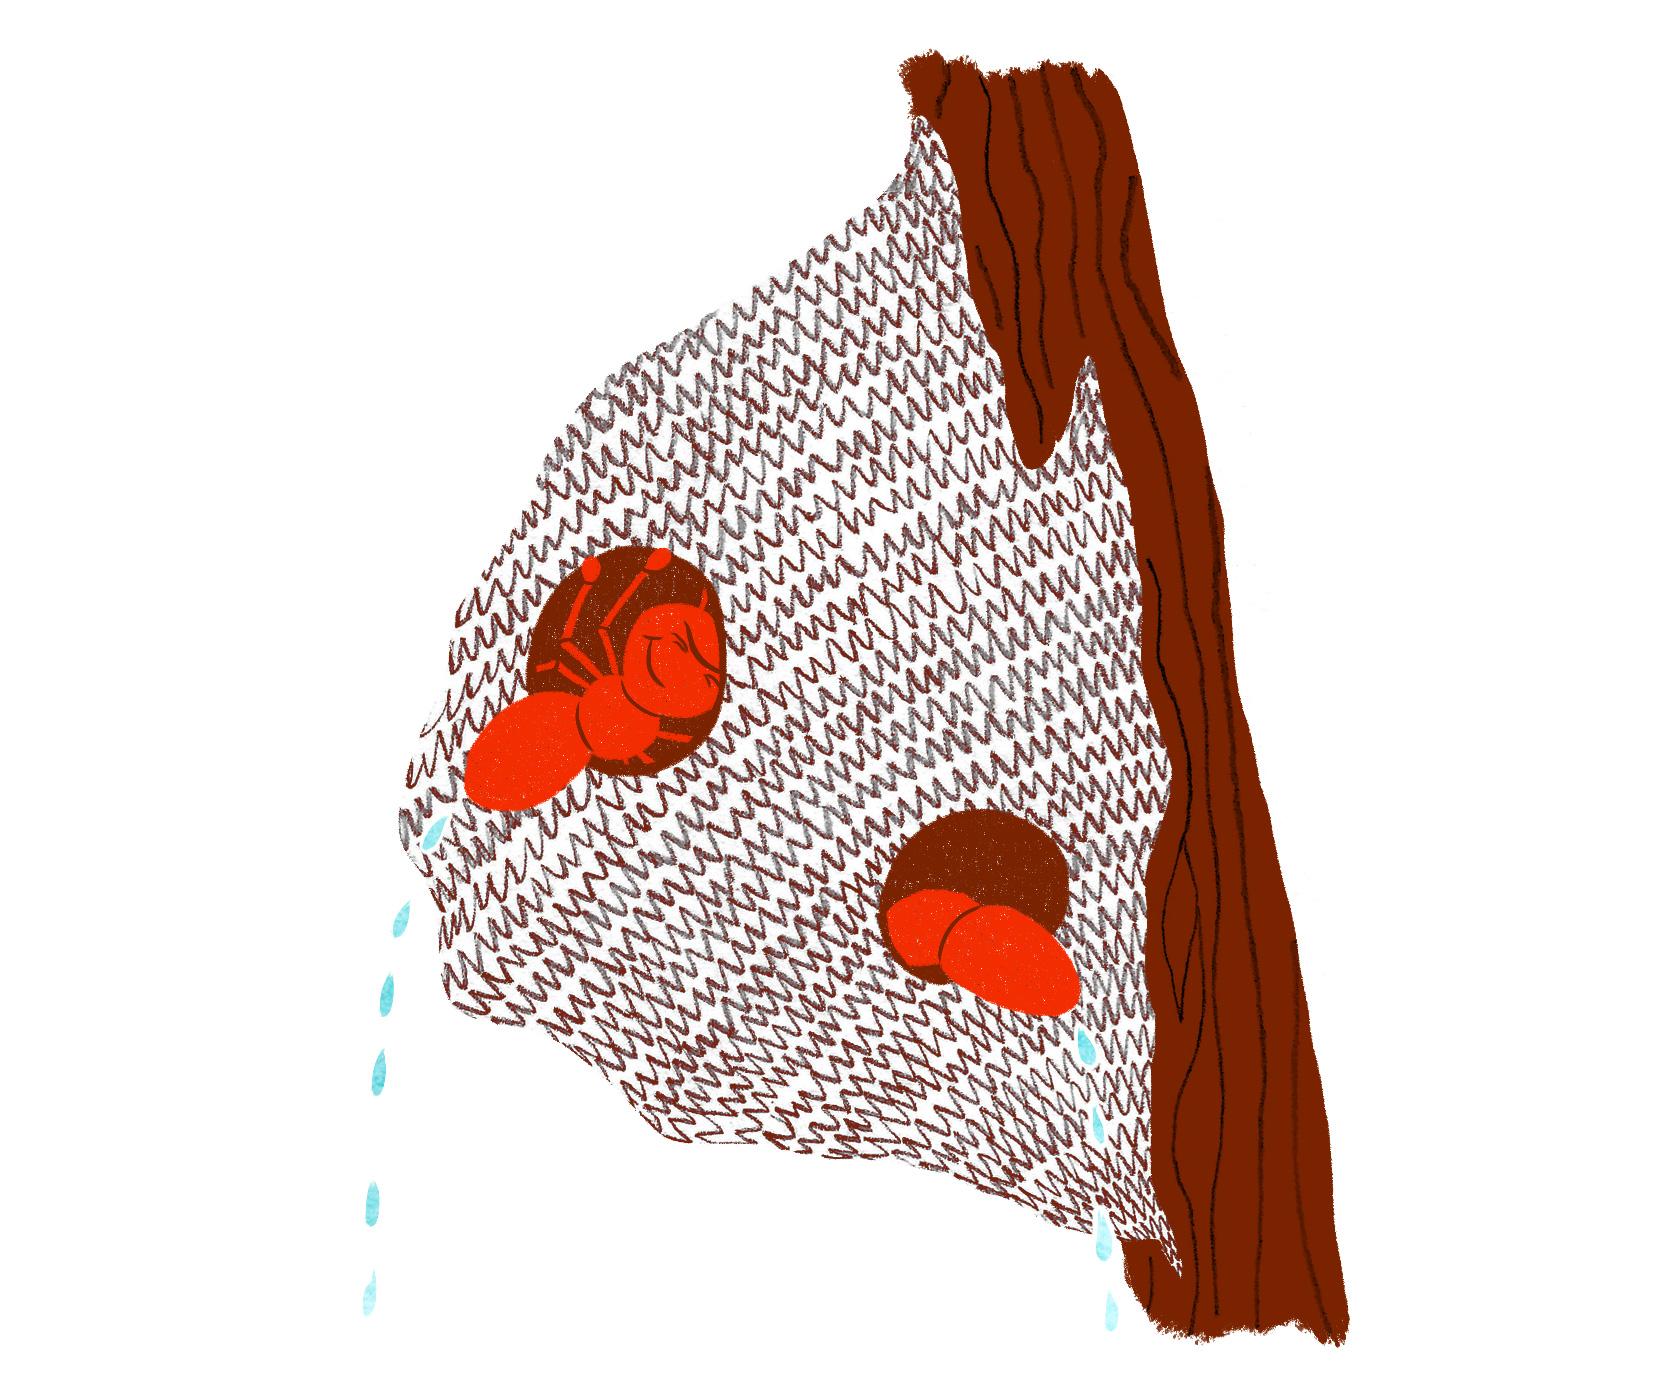 ESR-ant-survival-6-communal-peeing-low-res